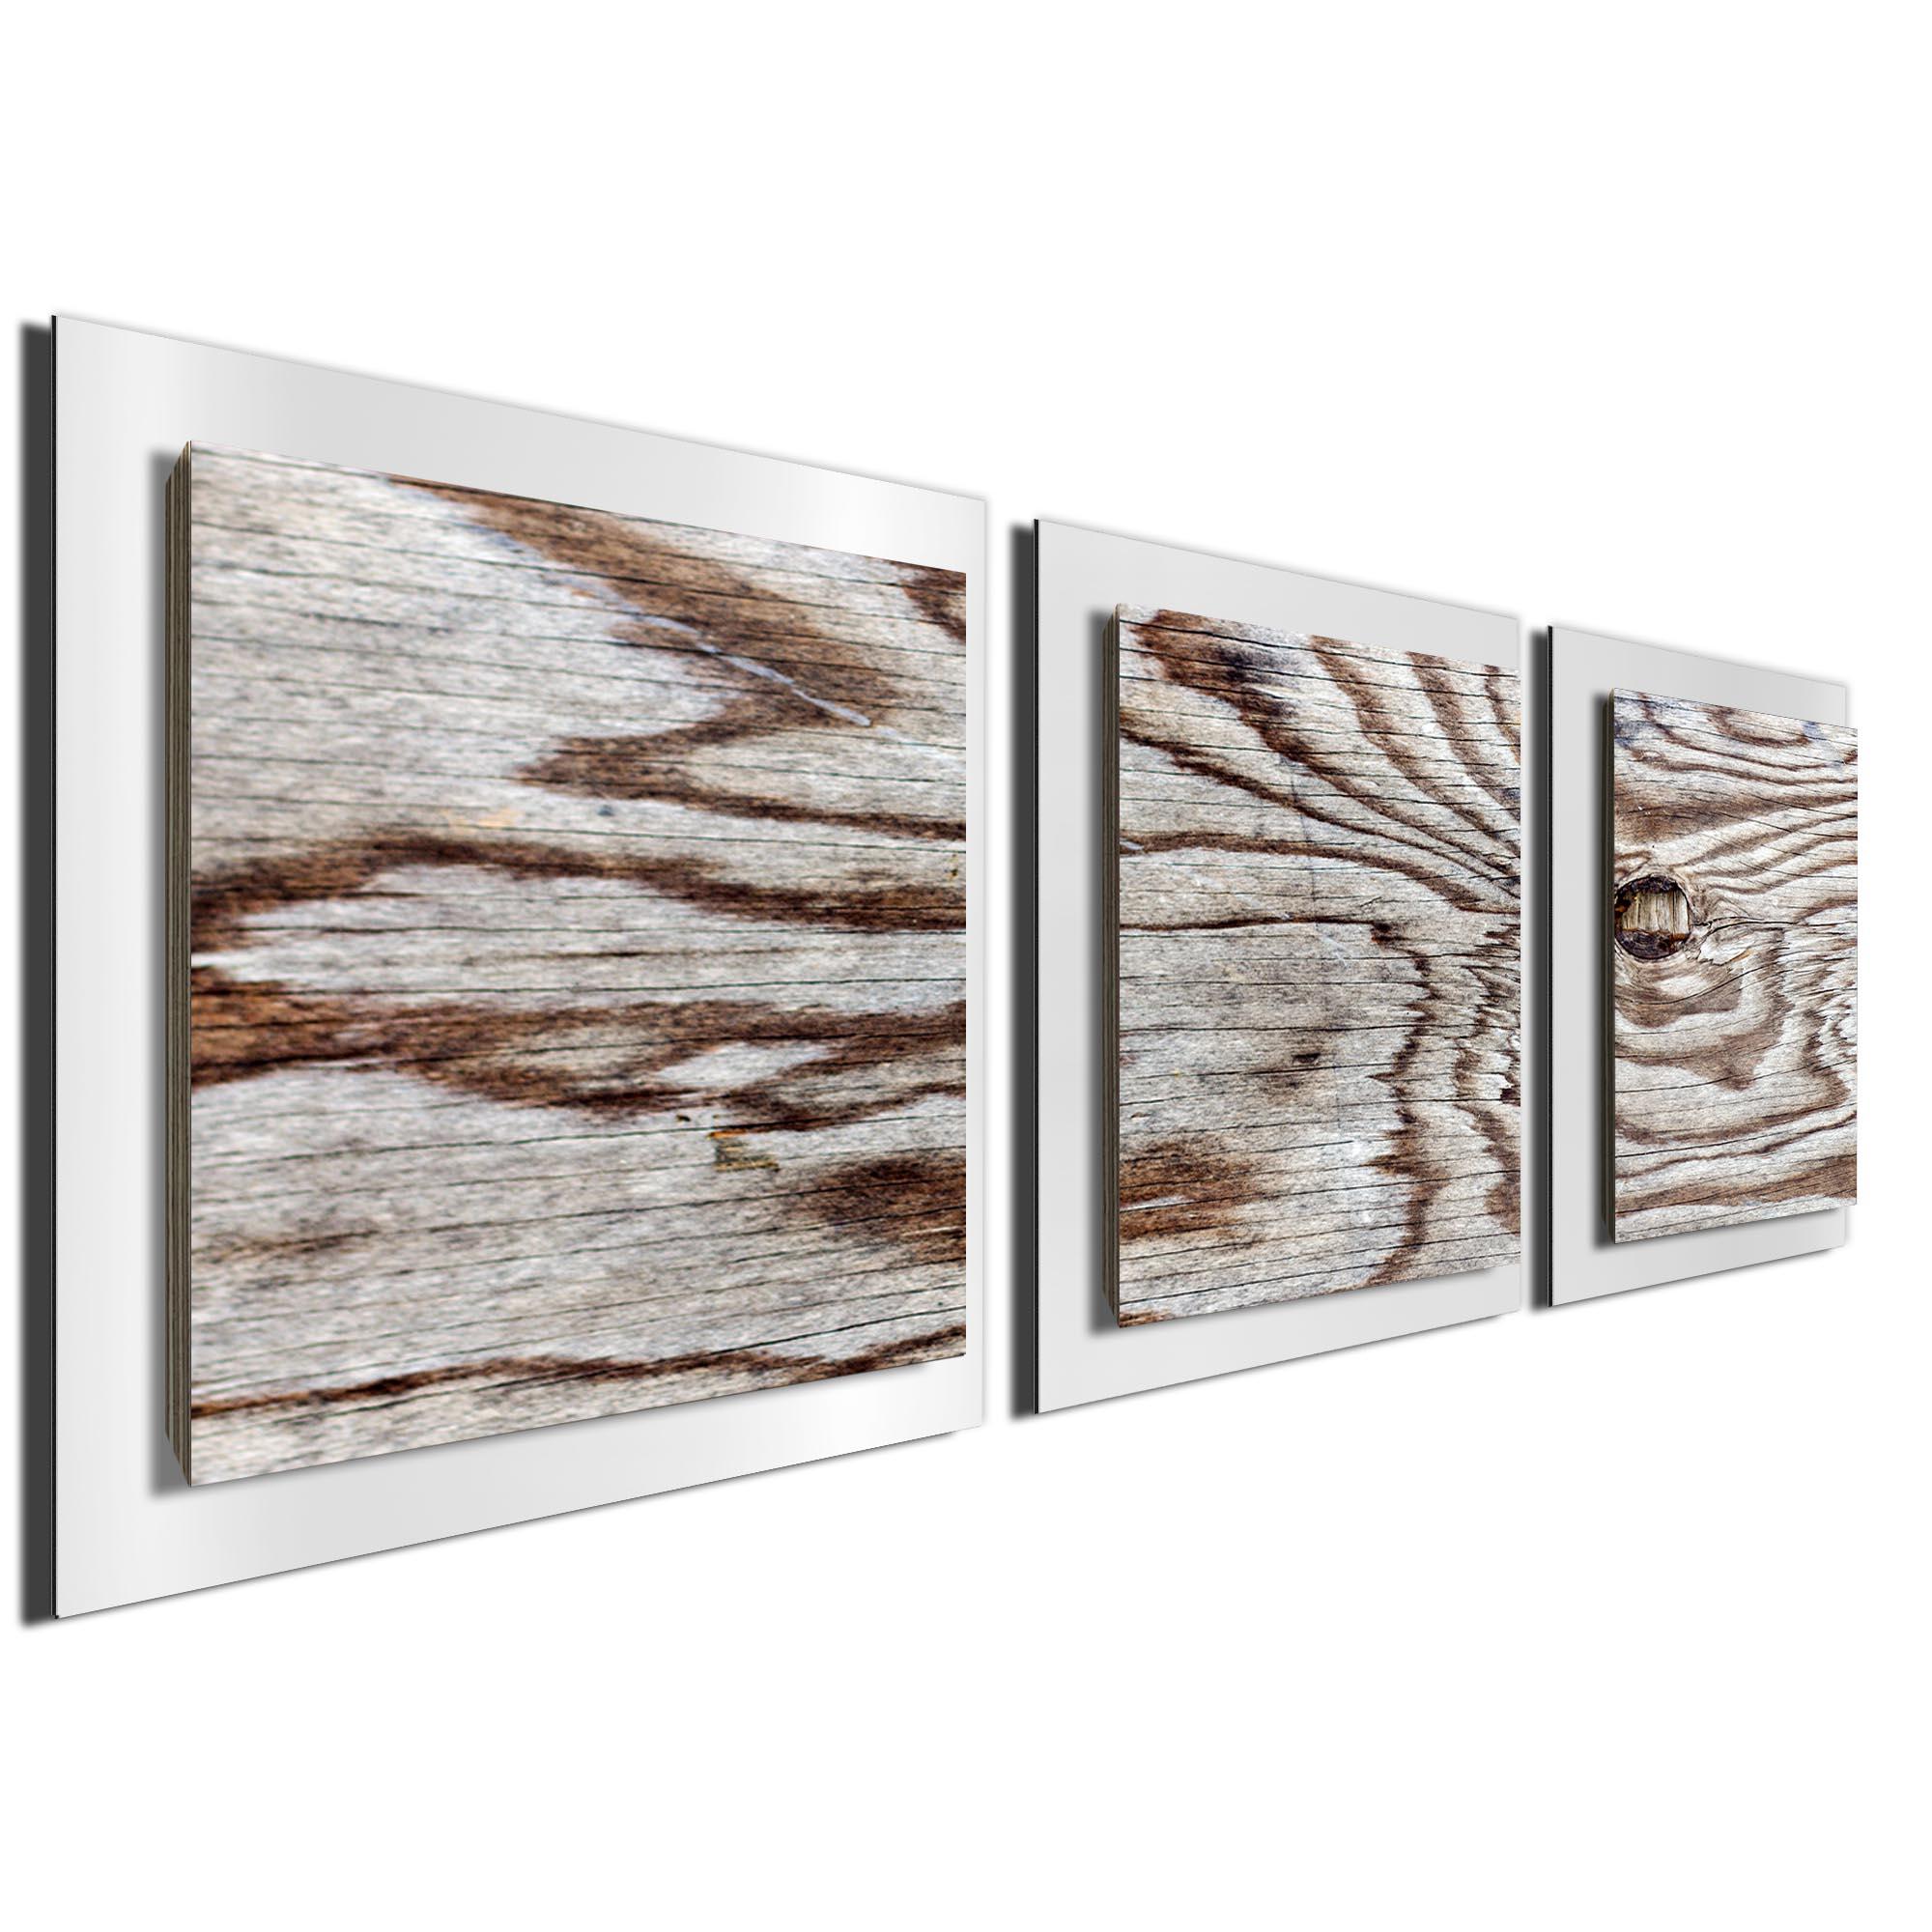 Weathered Wood Essence White by Adam Schwoeppe Rustic Modern Style Wood Wall Art - Image 2